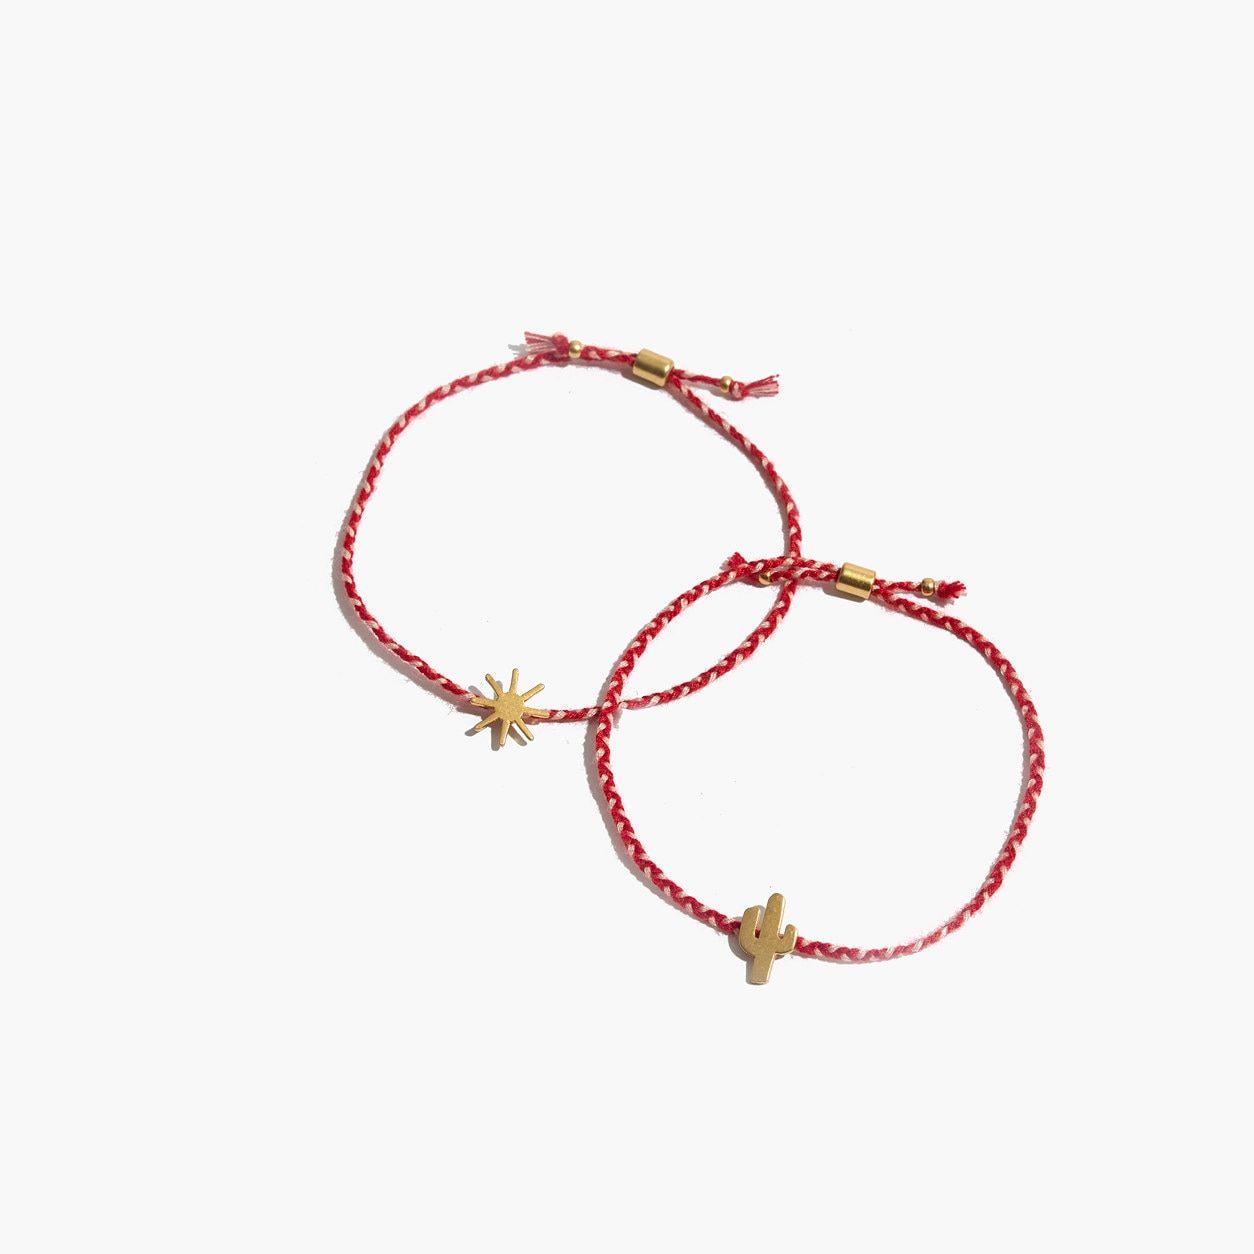 4419f339e4259 Two-Pack Friendship Bracelets | | j e w e l r y | | Friendship ...